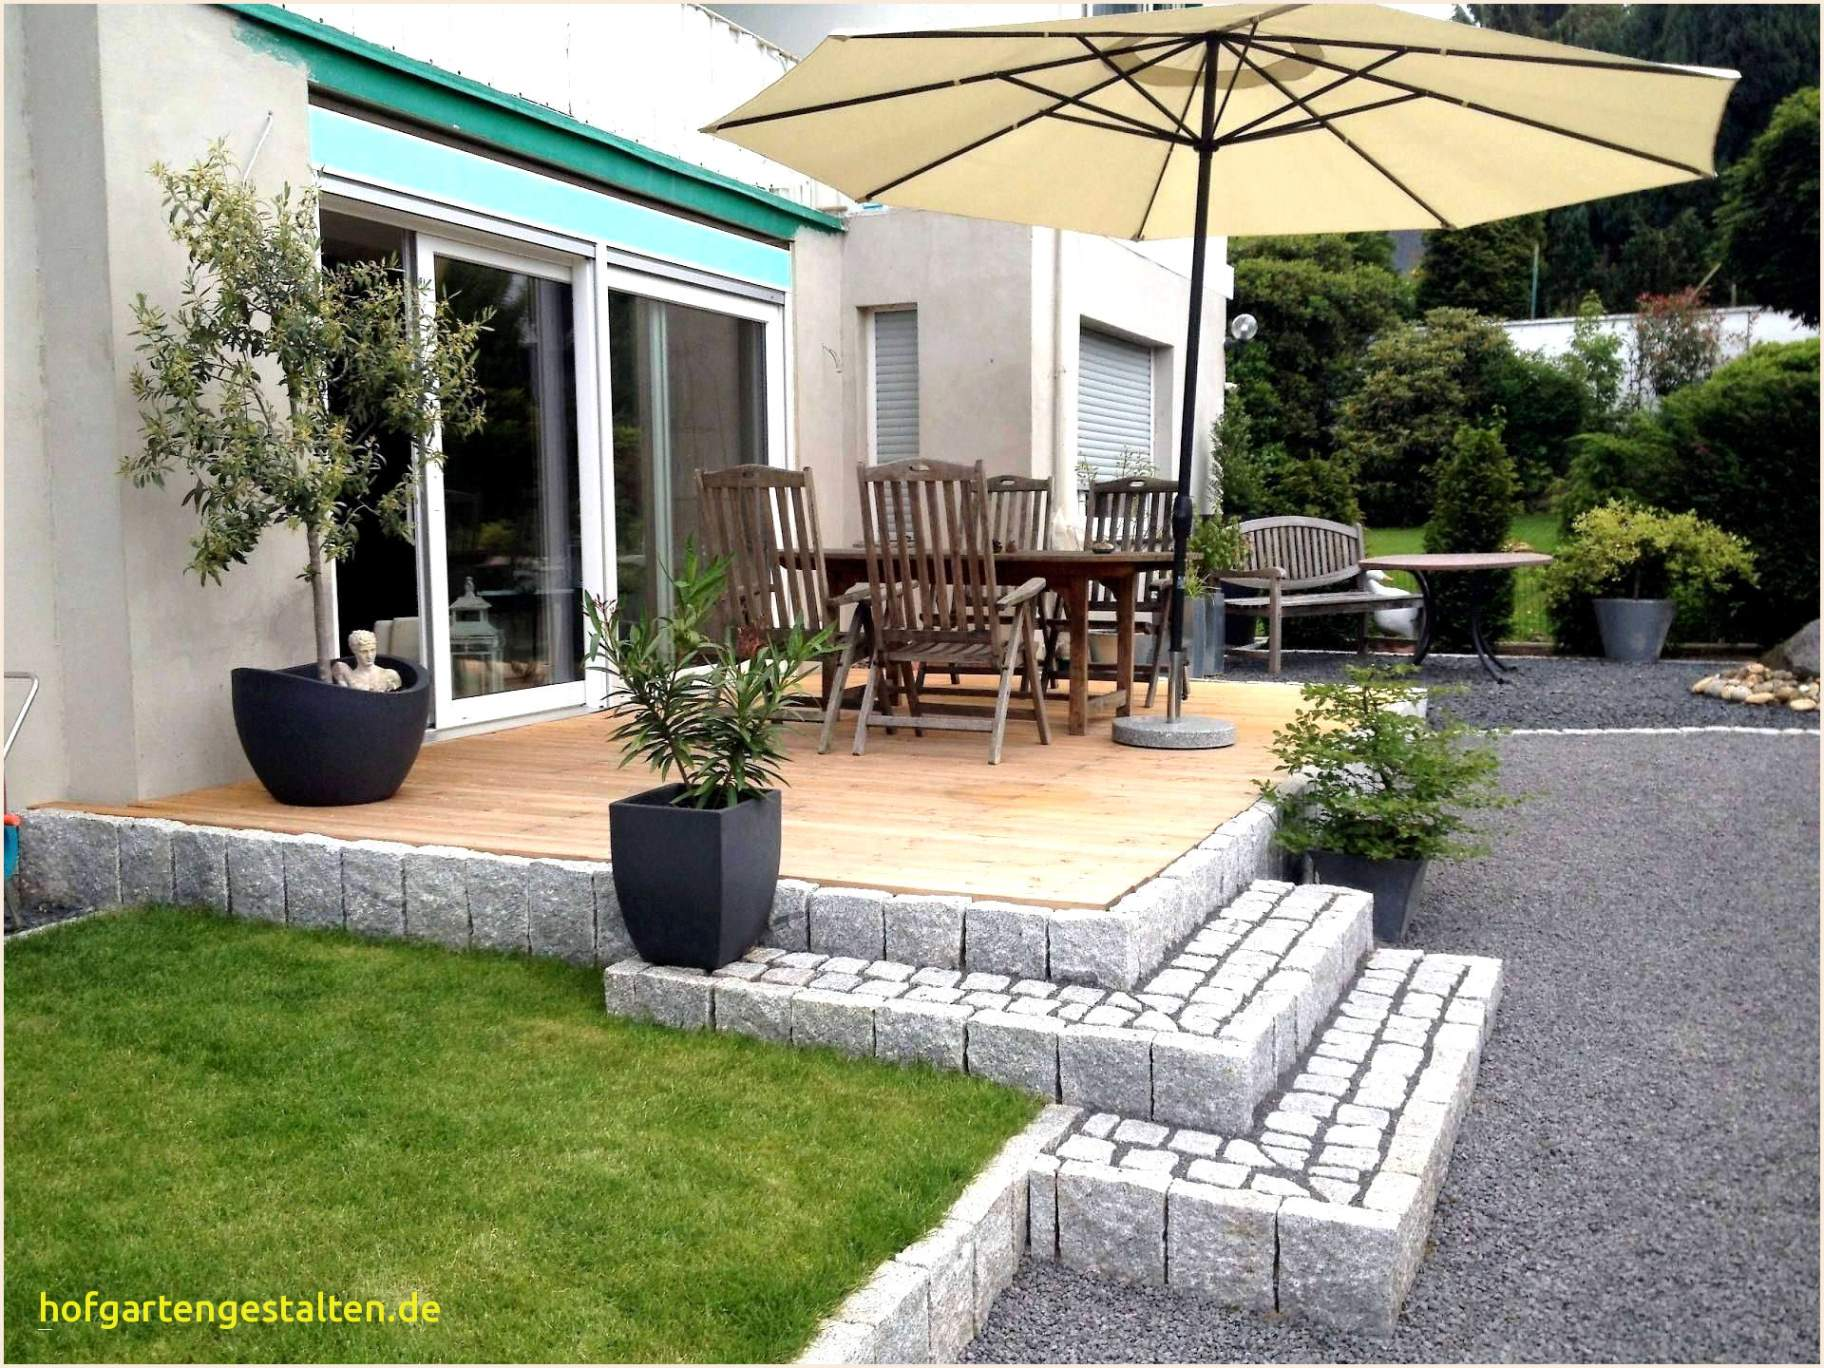 genial garten deko ideen terrassen deko selber machen terrassen deko selber machen